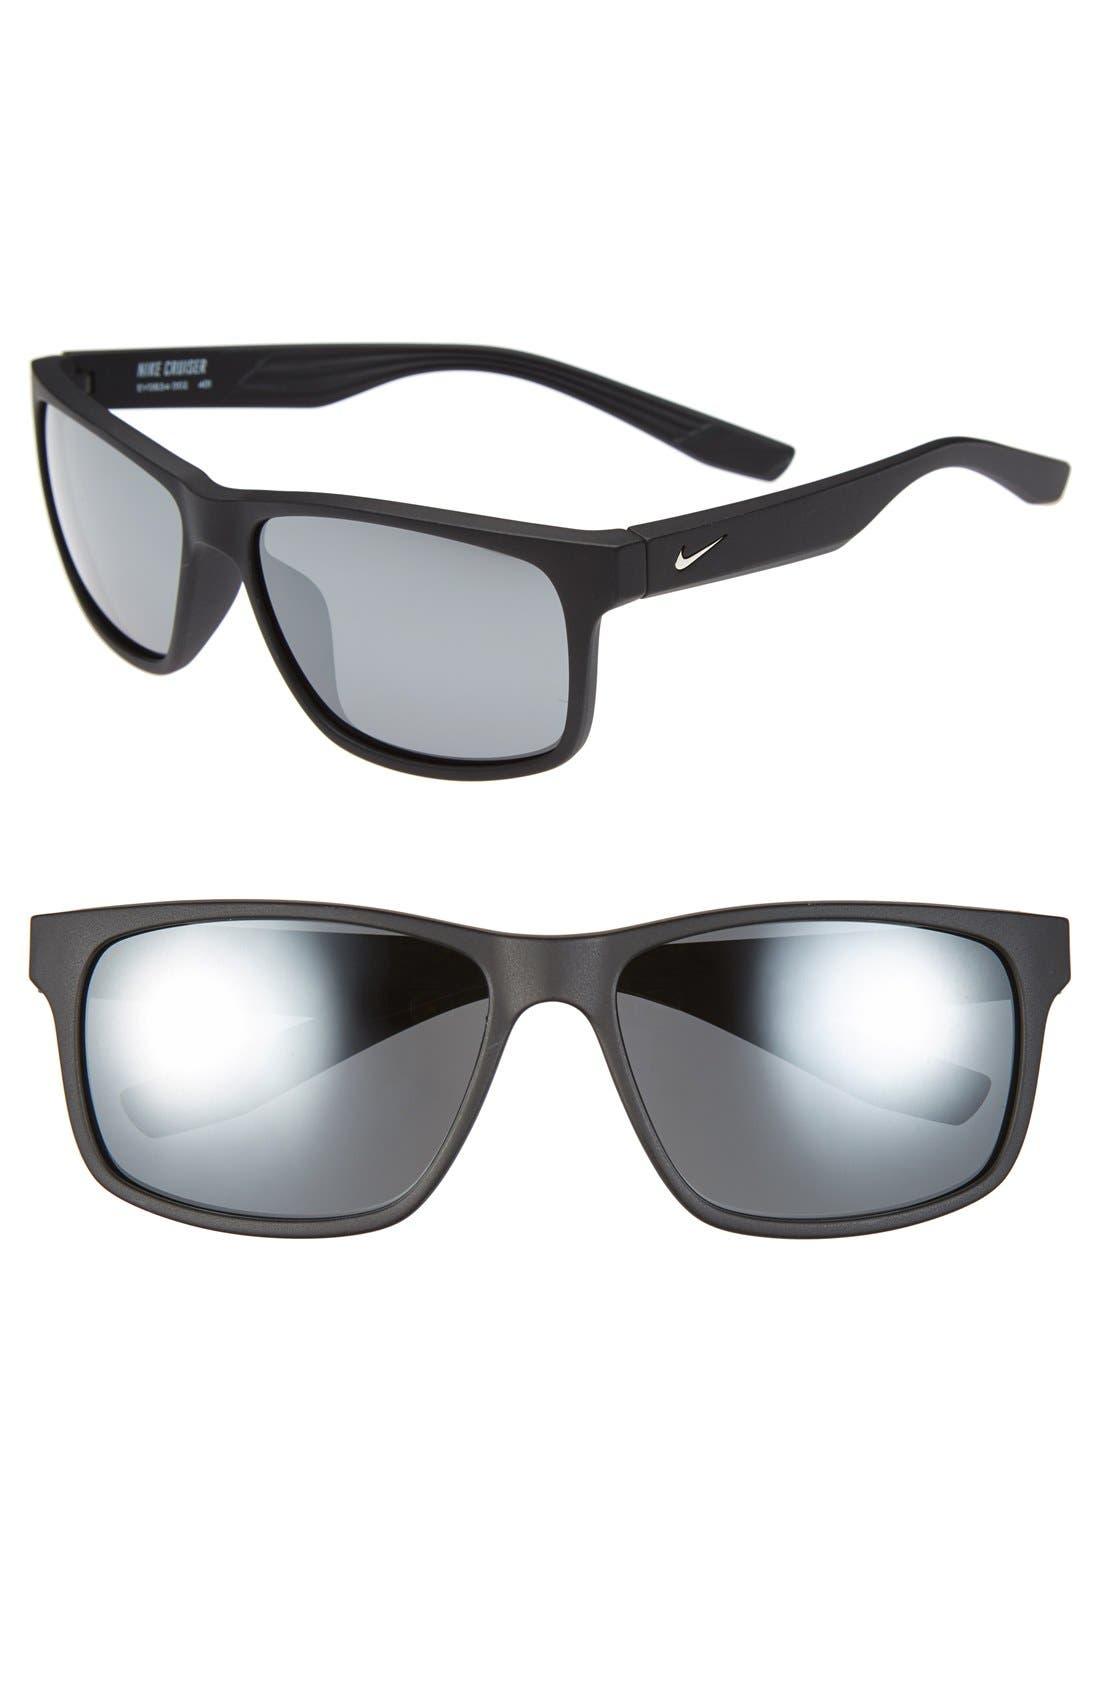 ae63706586 Nike  Cruiser  5m Sunglasses -